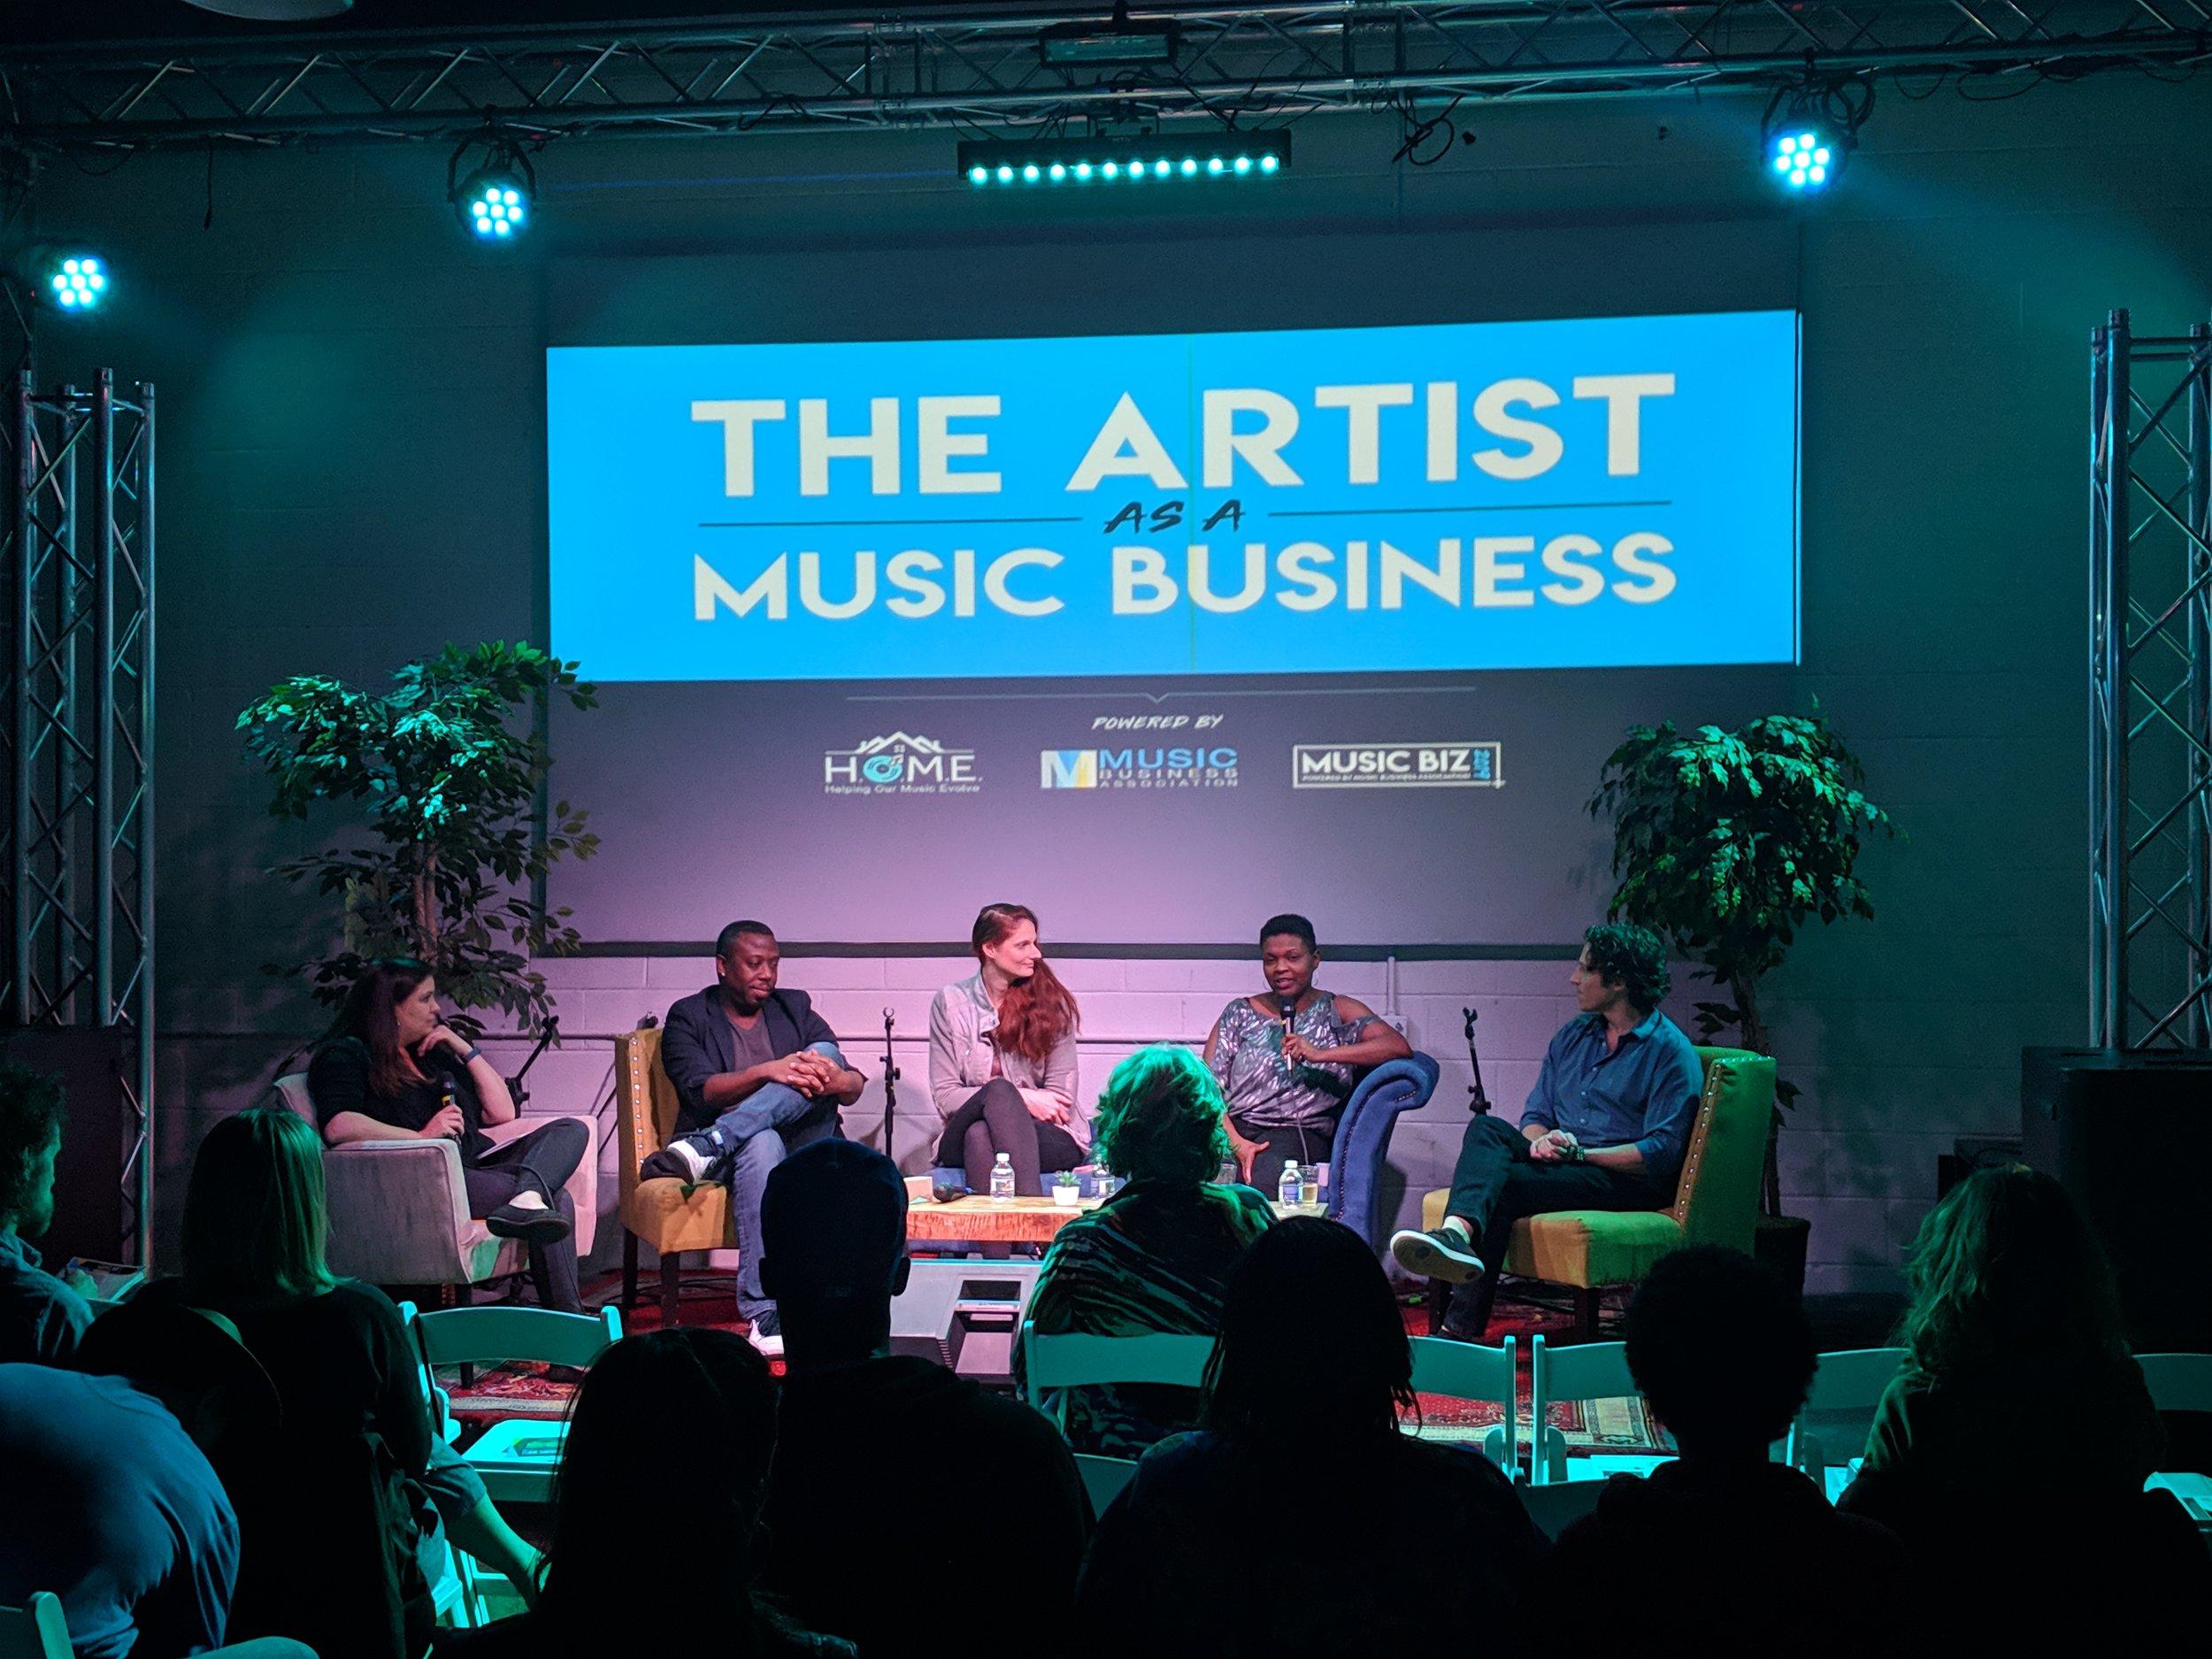 Panel artist as music business 2.jpg